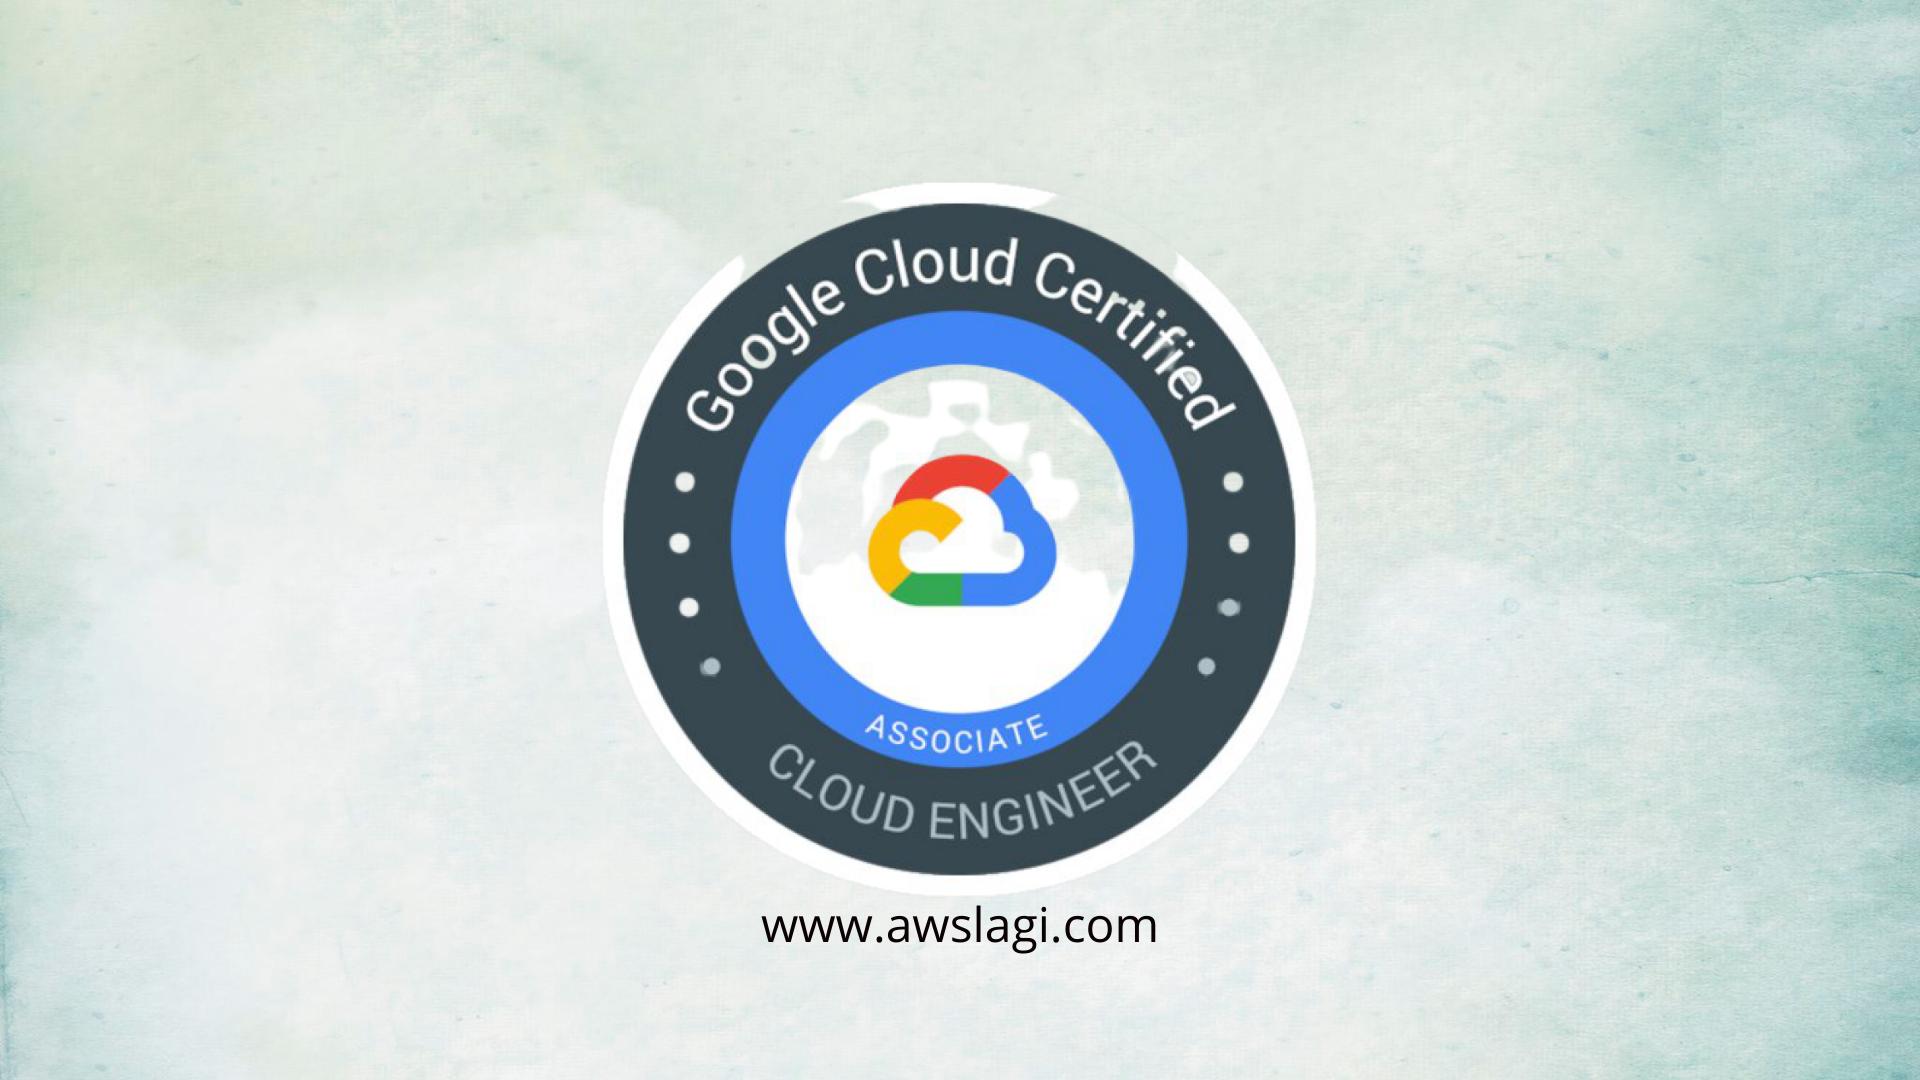 google-associate-cloud-engineer-actual-exam-logo